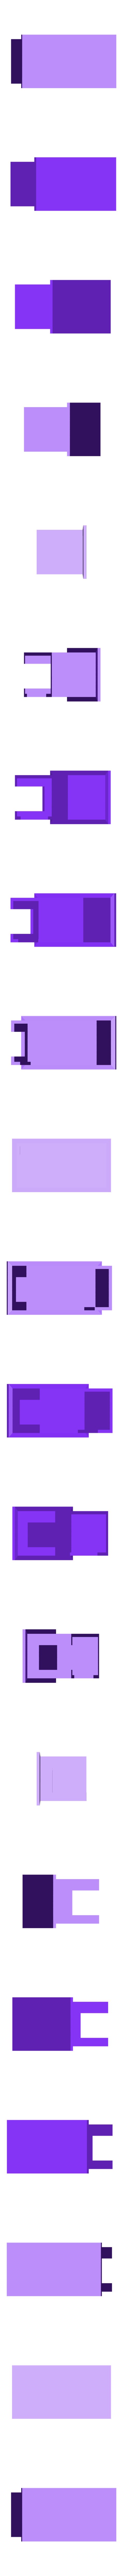 Abri de quai.STL Download free STL file Shelter for dock • 3D print object, dede34500